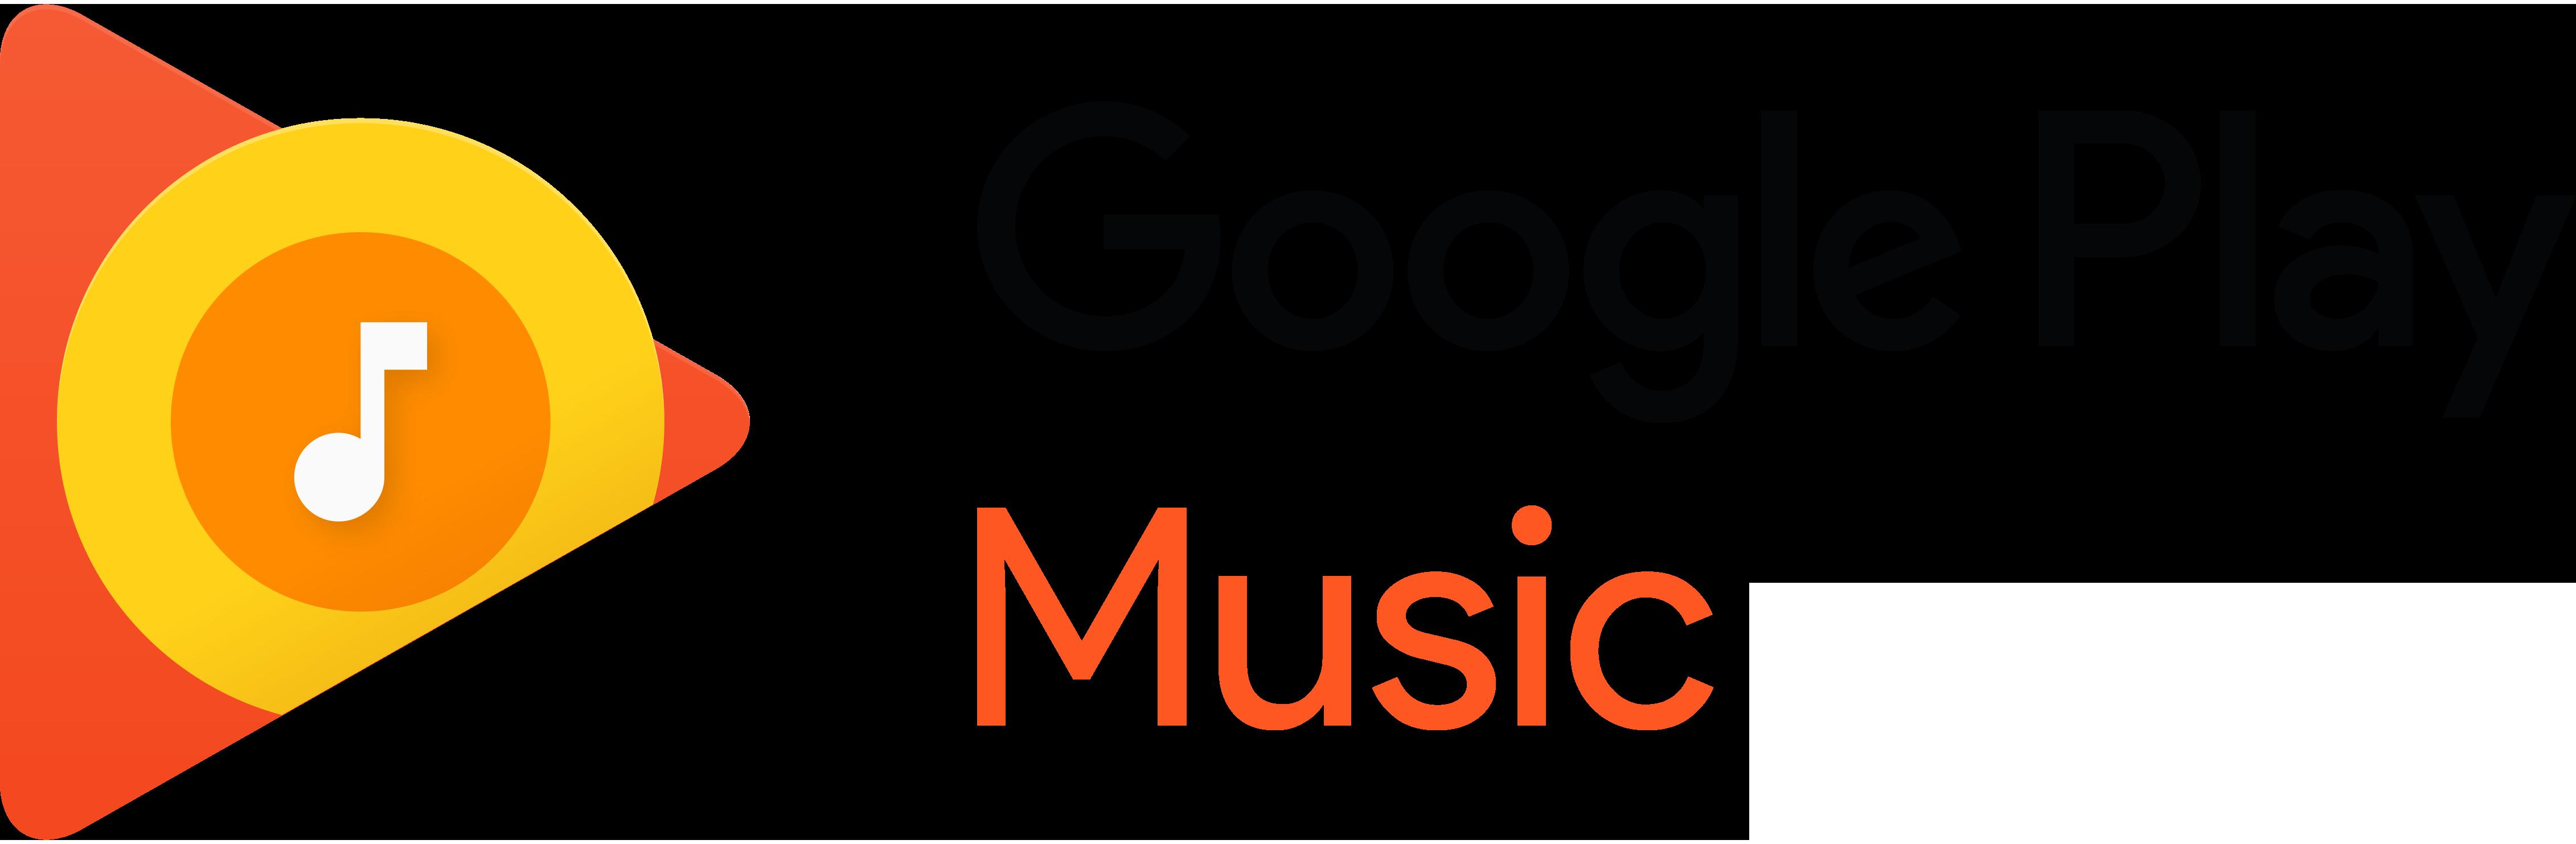 Holnap indul a Youtube Spotify vetélytárs streaming